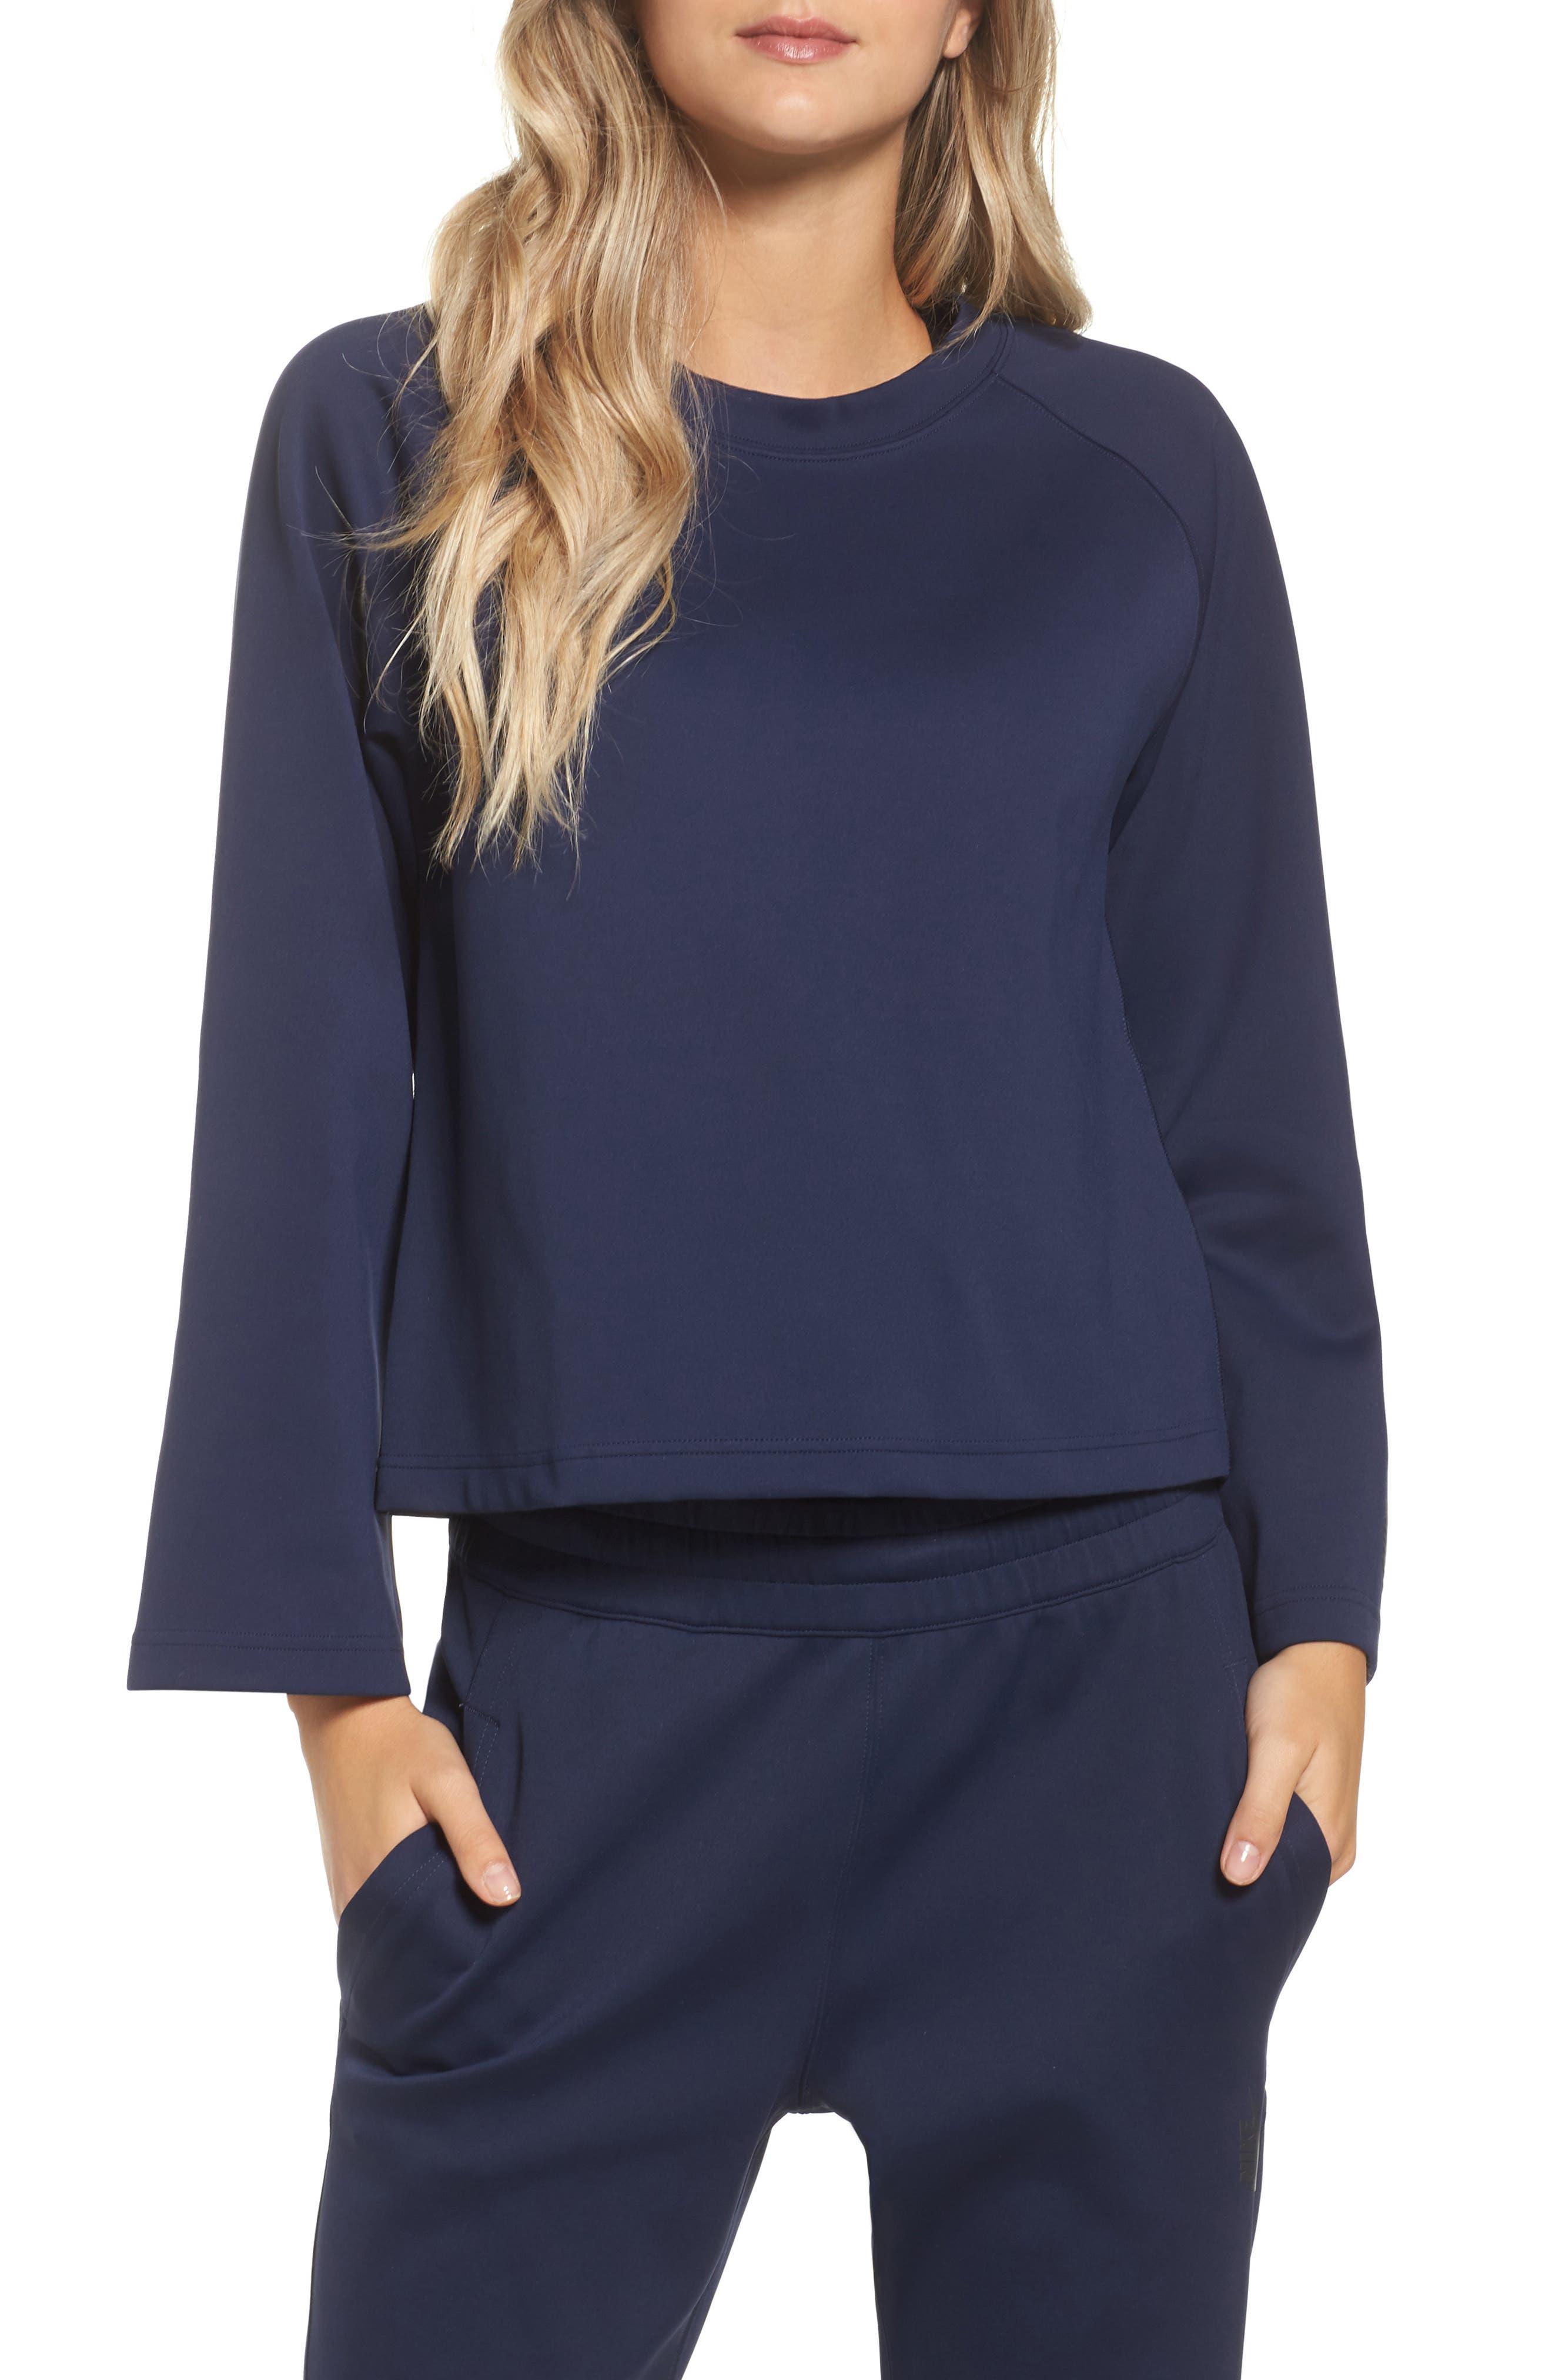 NikeLab Essentials Women's Fleece Top,                             Main thumbnail 2, color,